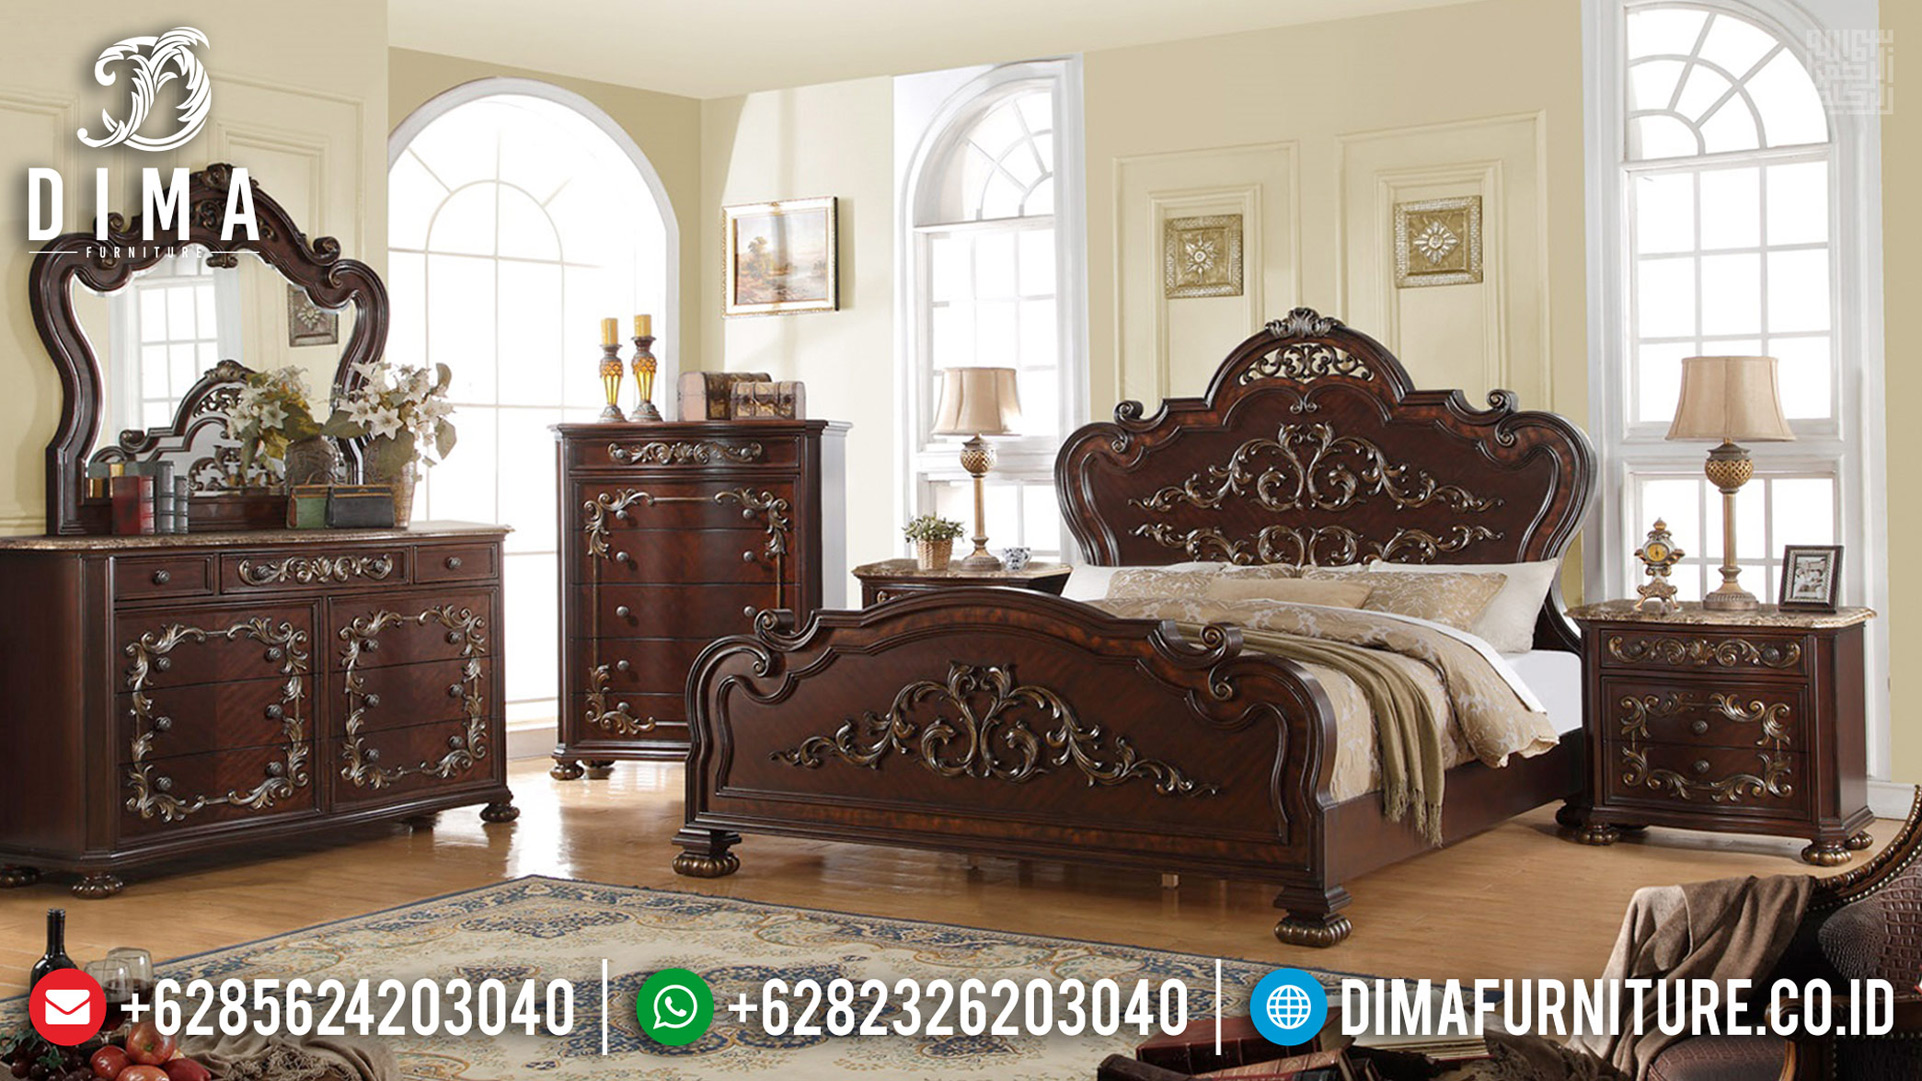 Jual Kamar Set Mewah Natural Jati Perhutani Best Quality Product MMJ-0662